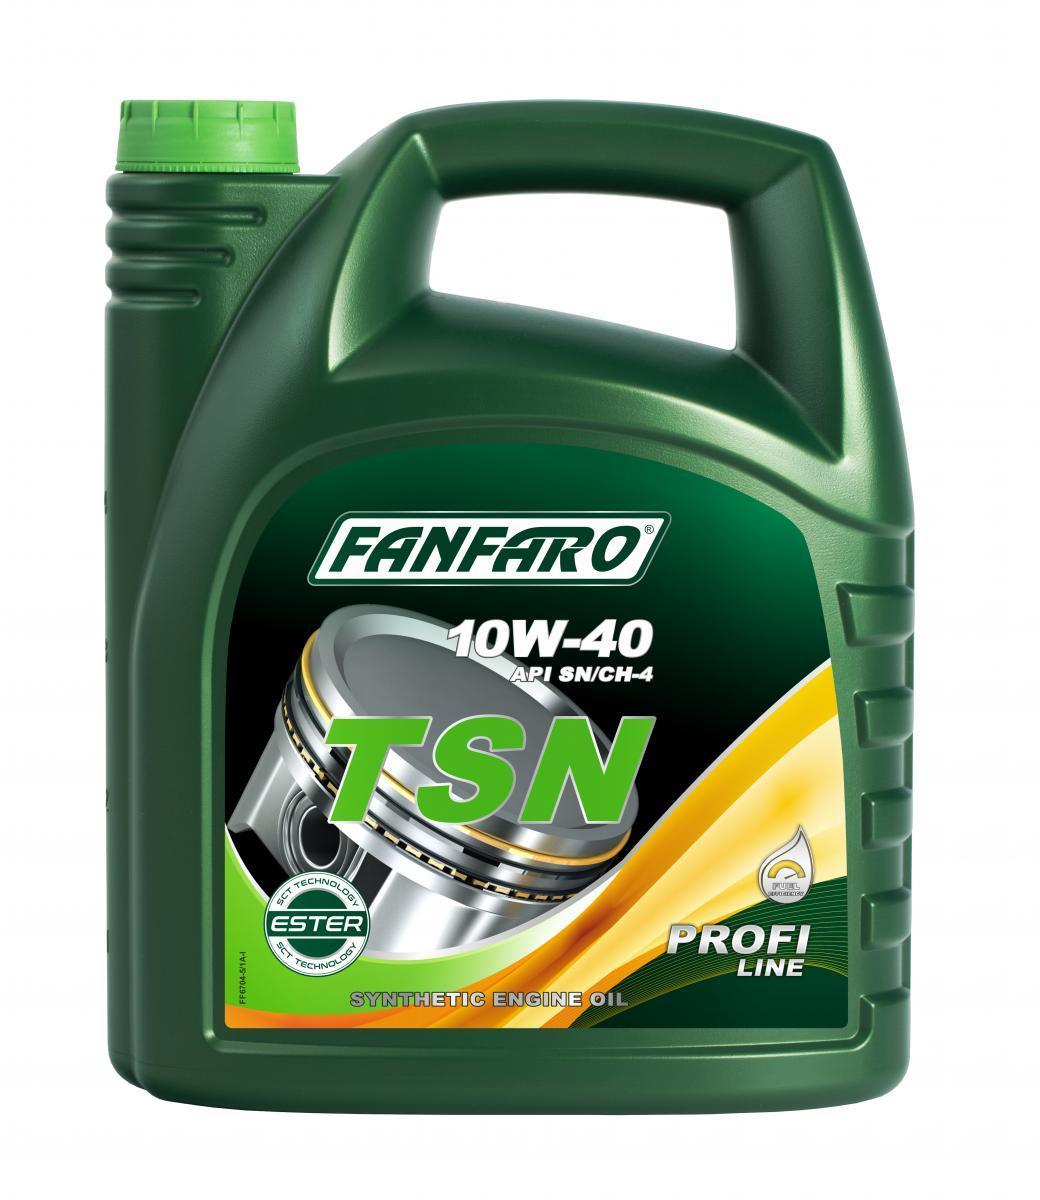 FF6704-5 FANFARO Profi Line, TSN 10W-40, 5l, Synthetiköl Motoröl FF6704-5 günstig kaufen